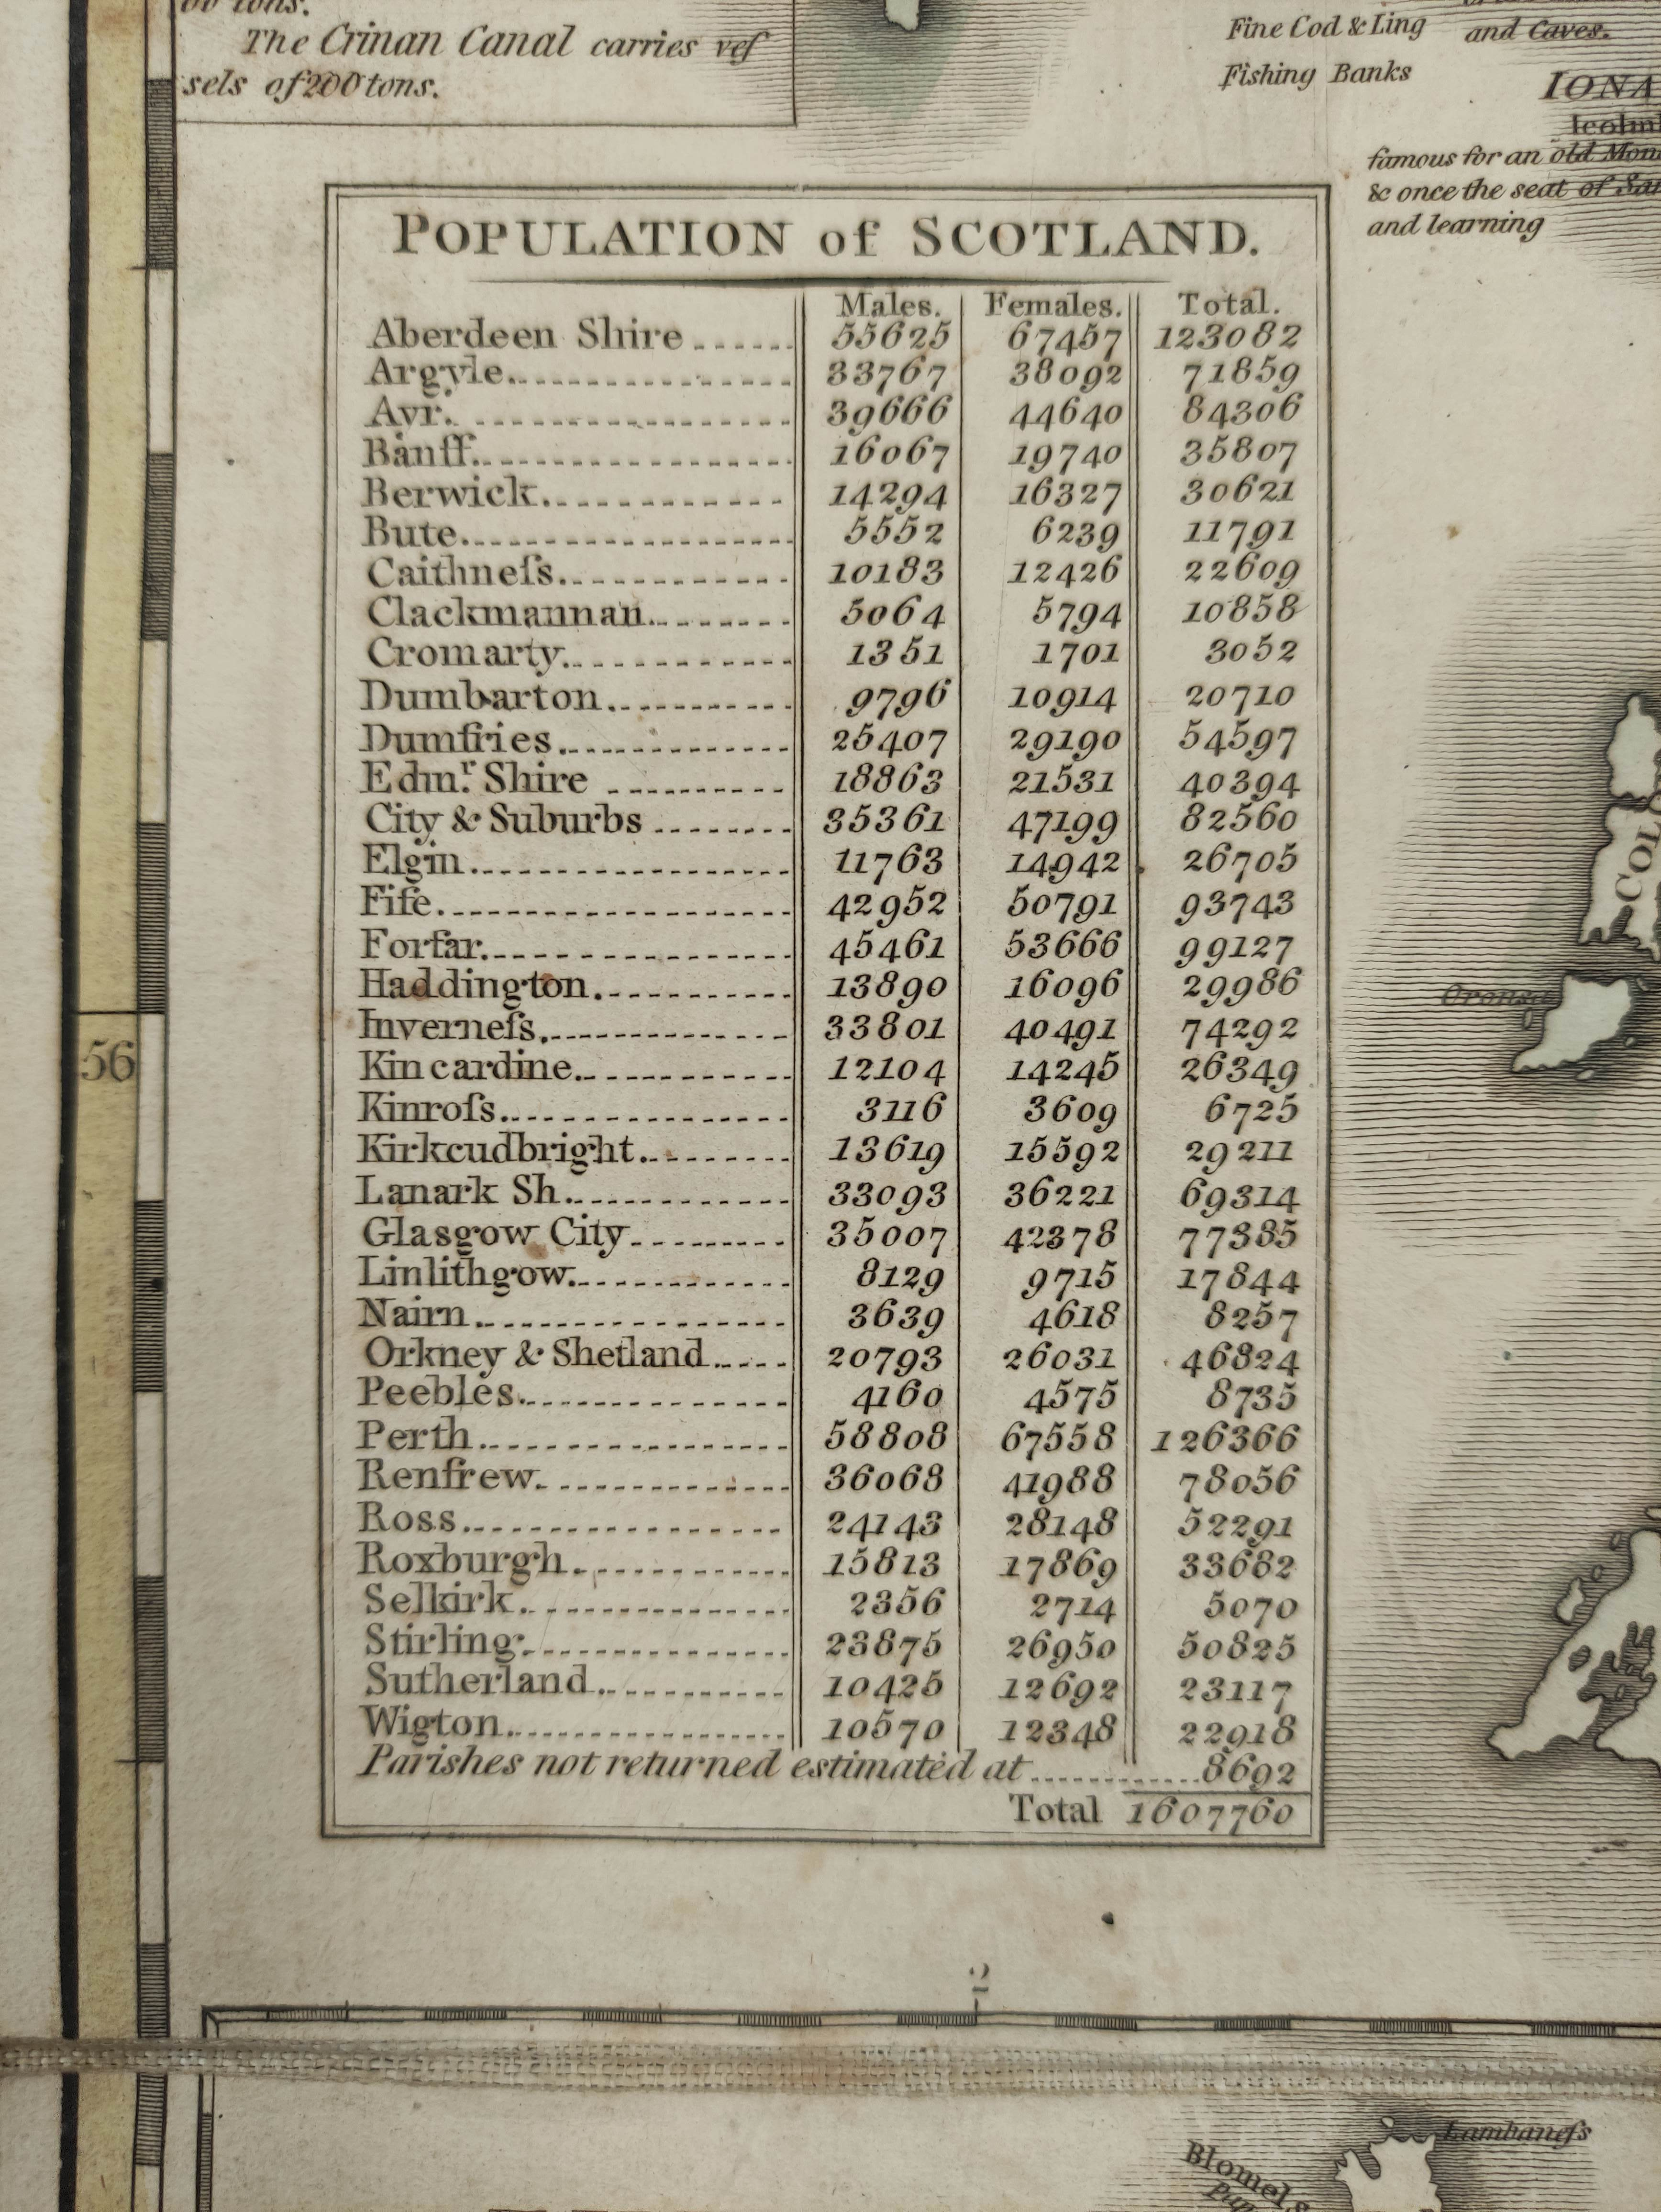 KIRKWOOD J. & SONS.Map of Scotland. Hand col. eng. fldg. linen map in well worn orig. slip case. - Image 8 of 36